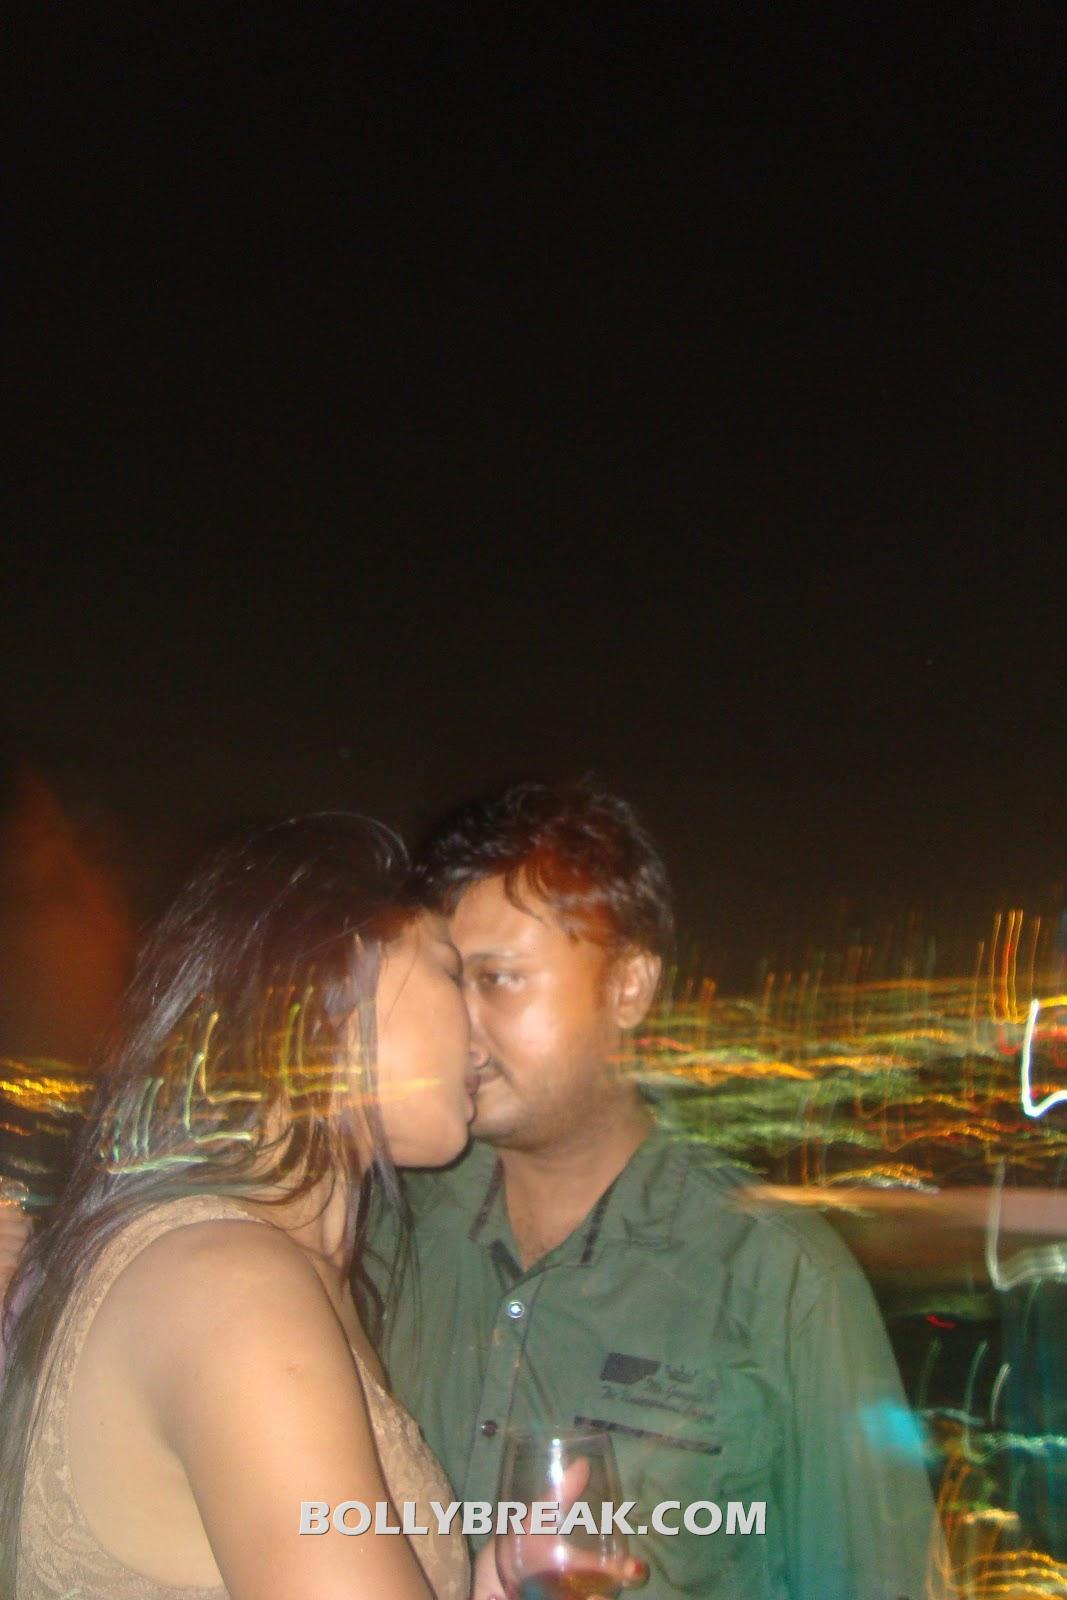 Veena Malik Hemant Madhukar kissing - (2) -  Veena Malik Hemant Madhukar Leaked Private Pics